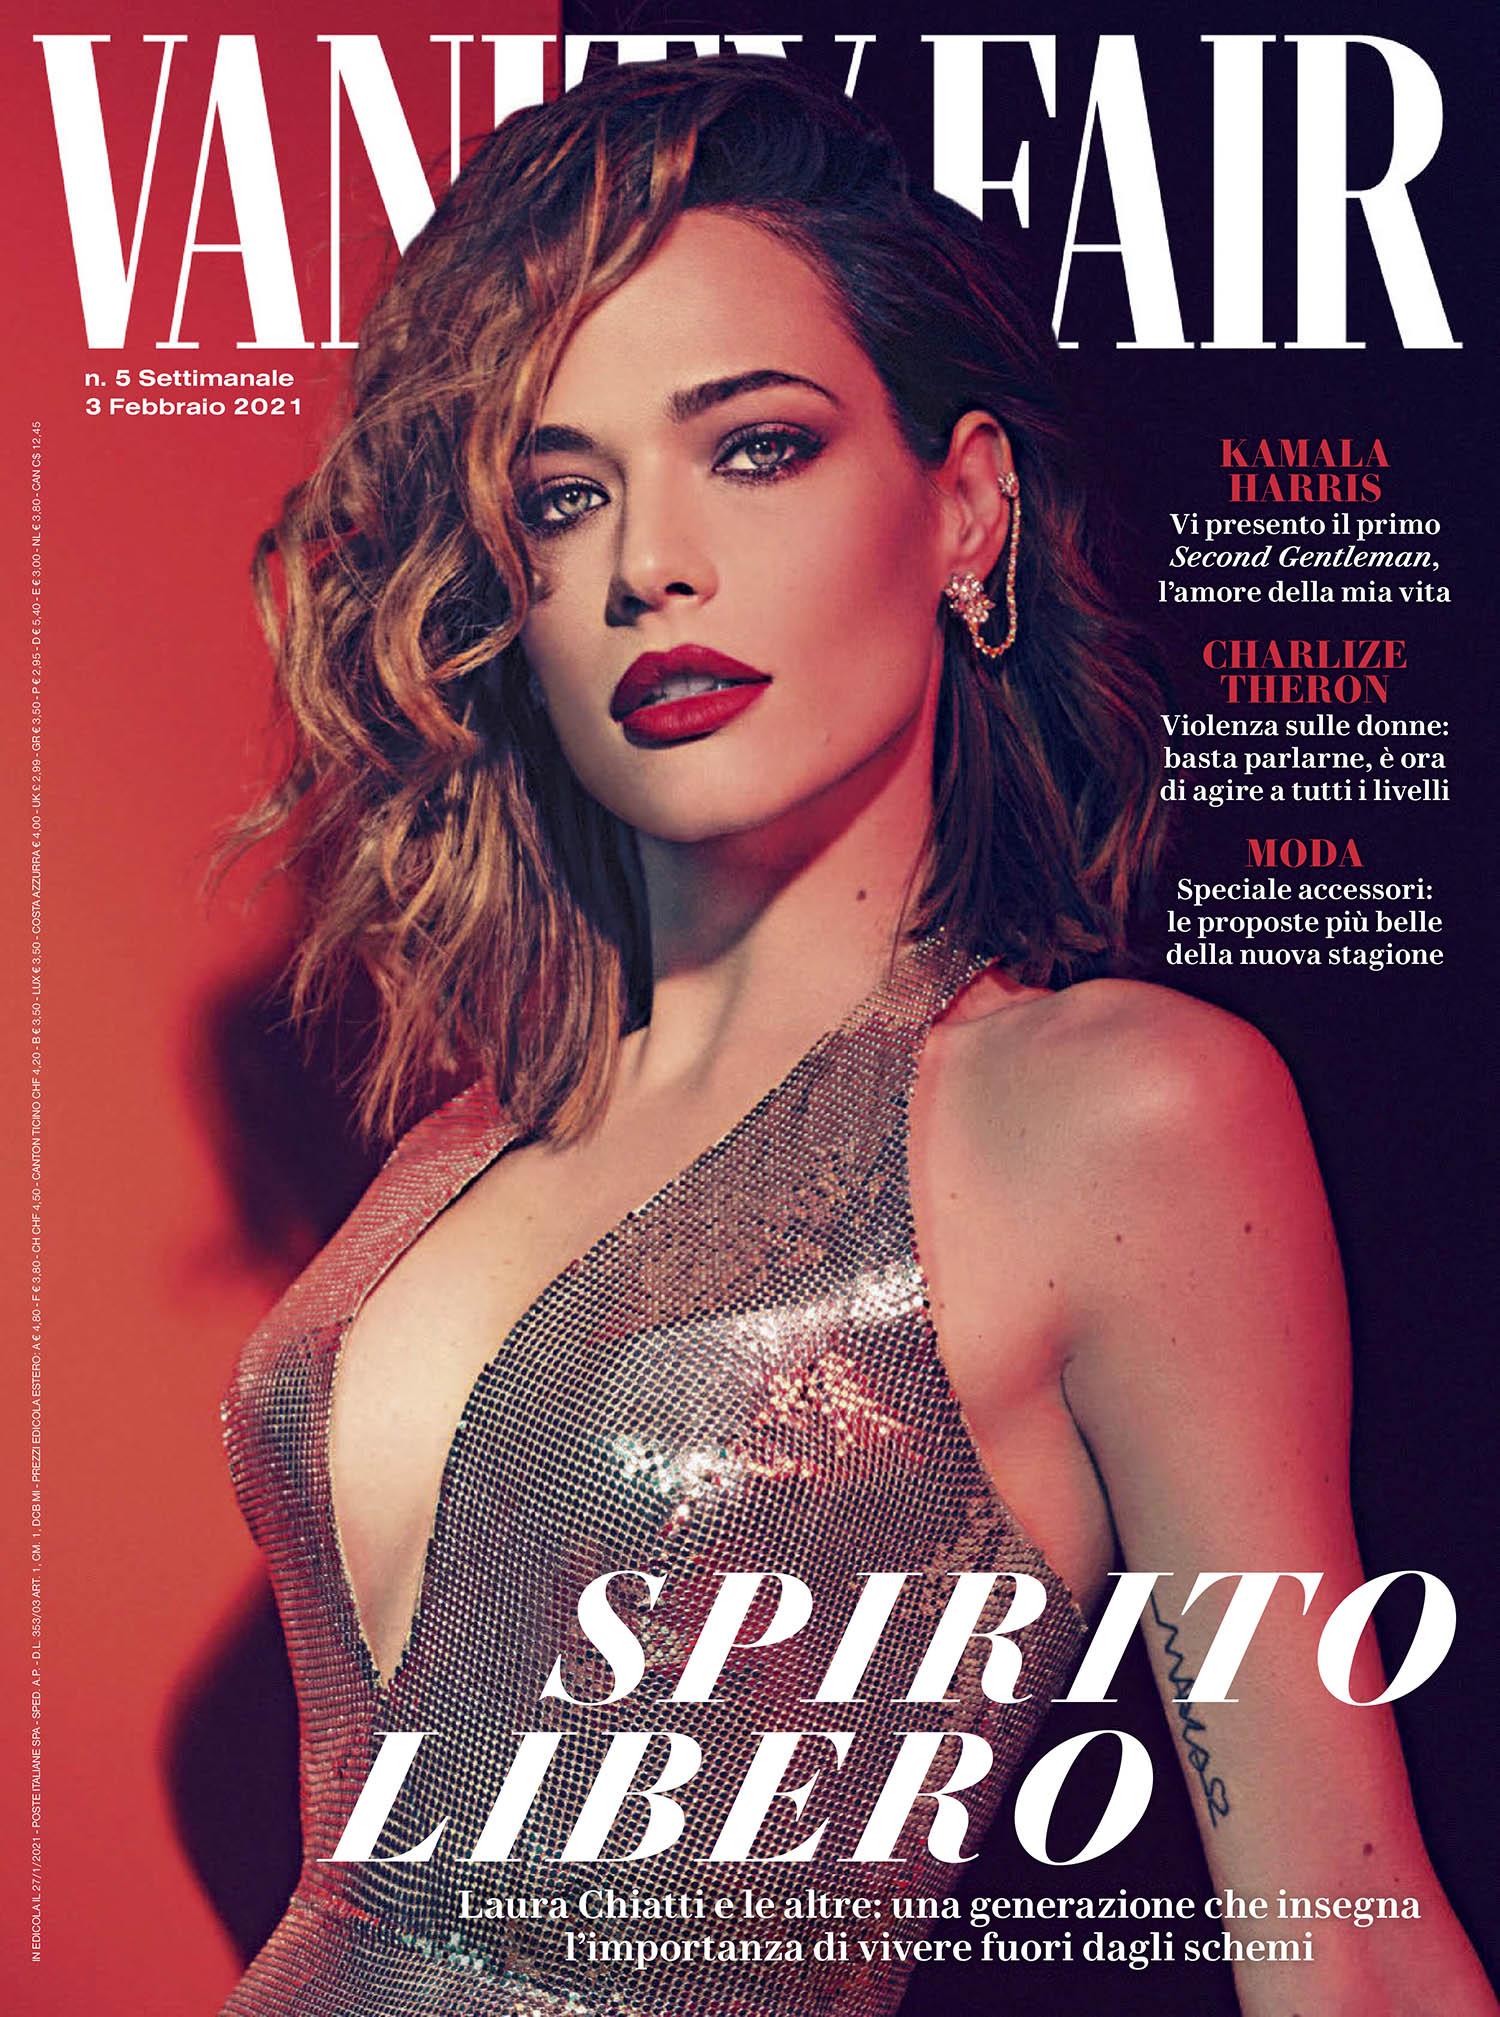 Laura Chiatti covers Vanity Fair Italia February 3rd, 2021 by Joseph Cardo